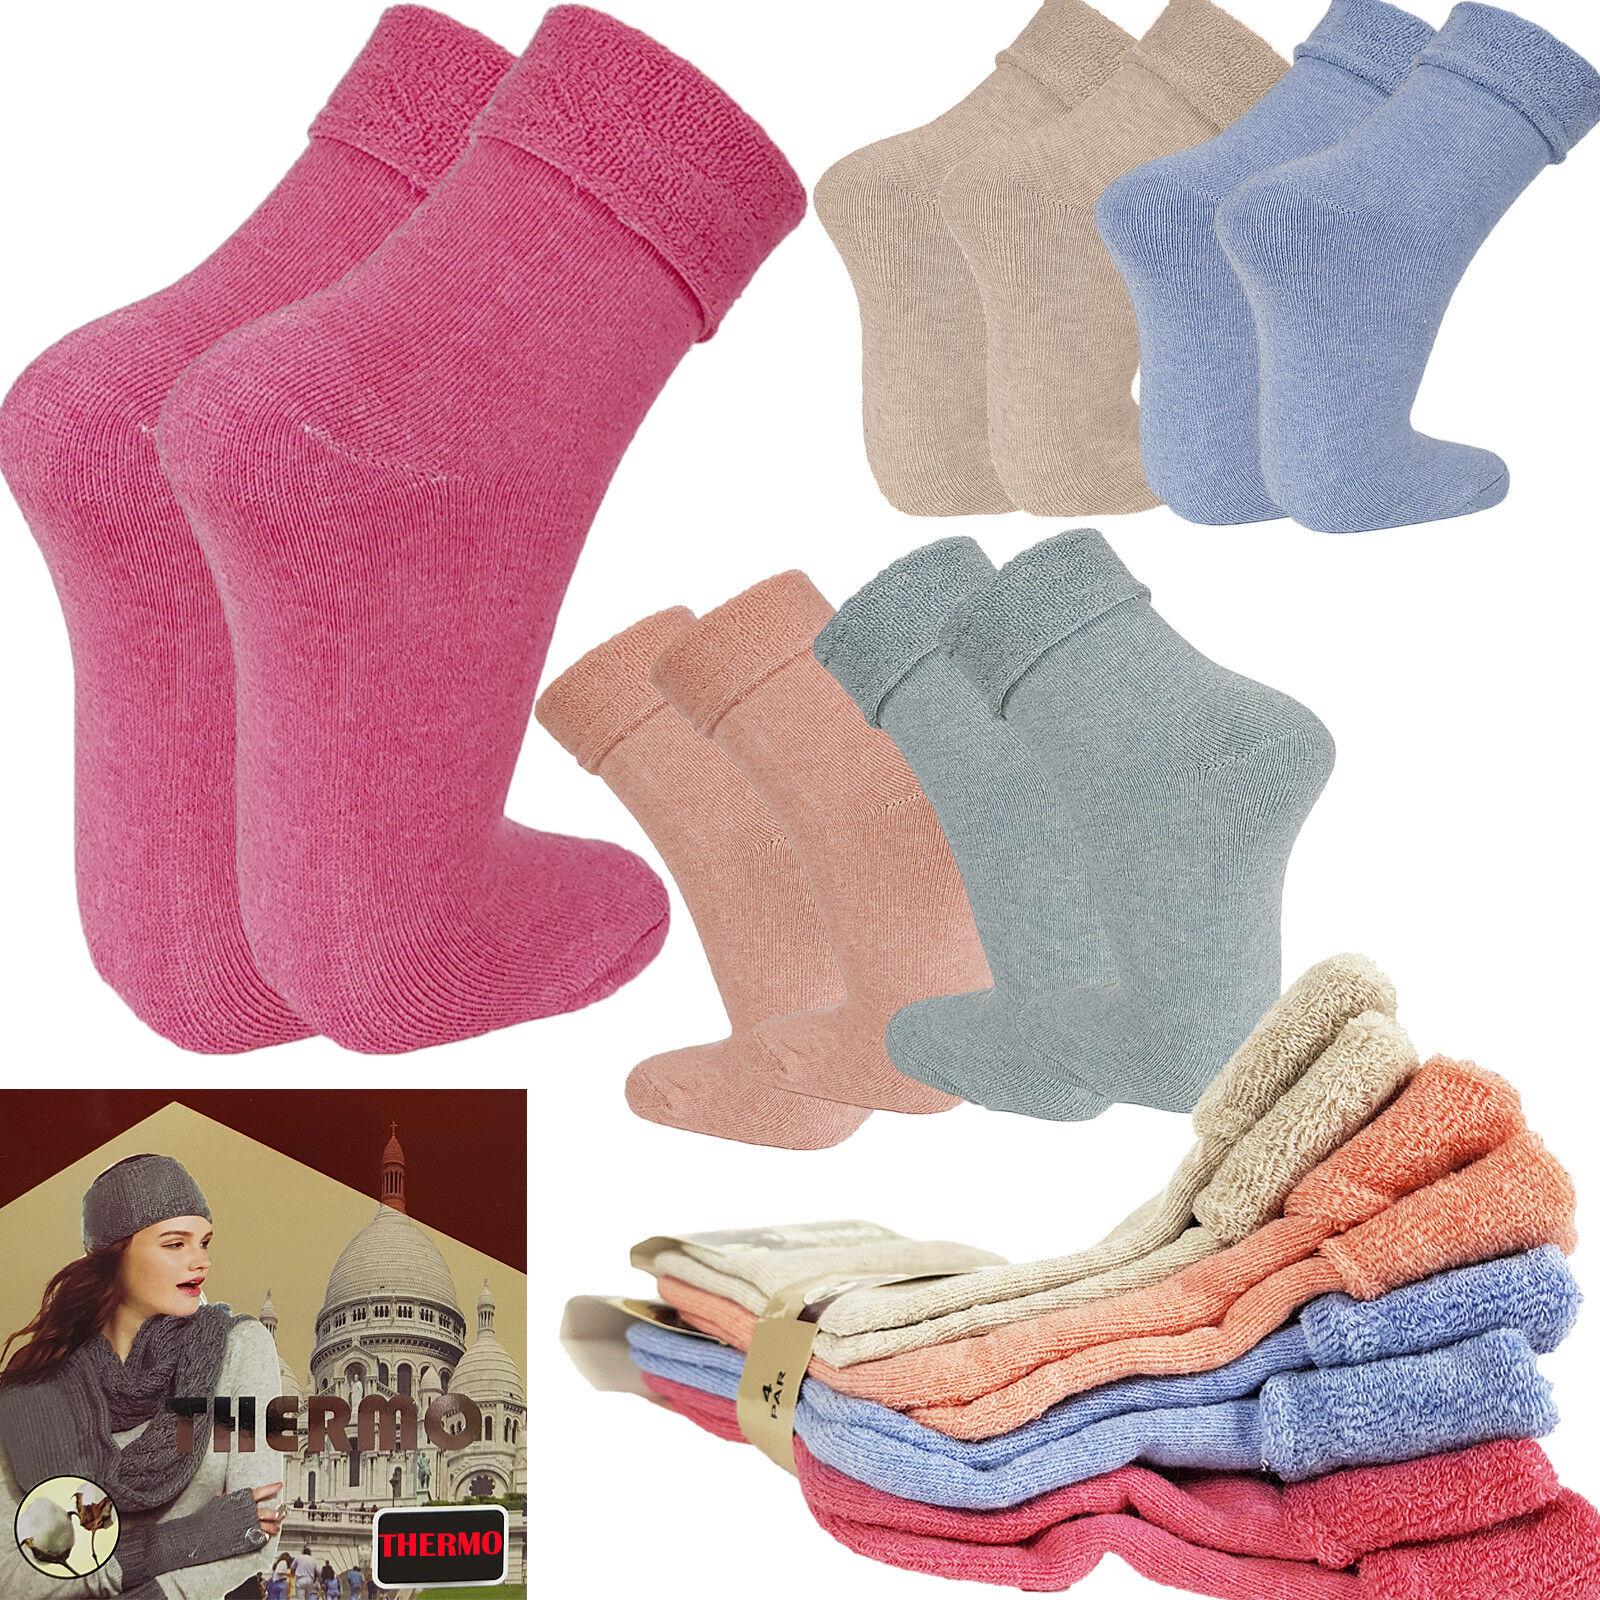 Thermo Socken Damen Herren winterstrümpfe extra warm 4 x Mix Farbe Neu